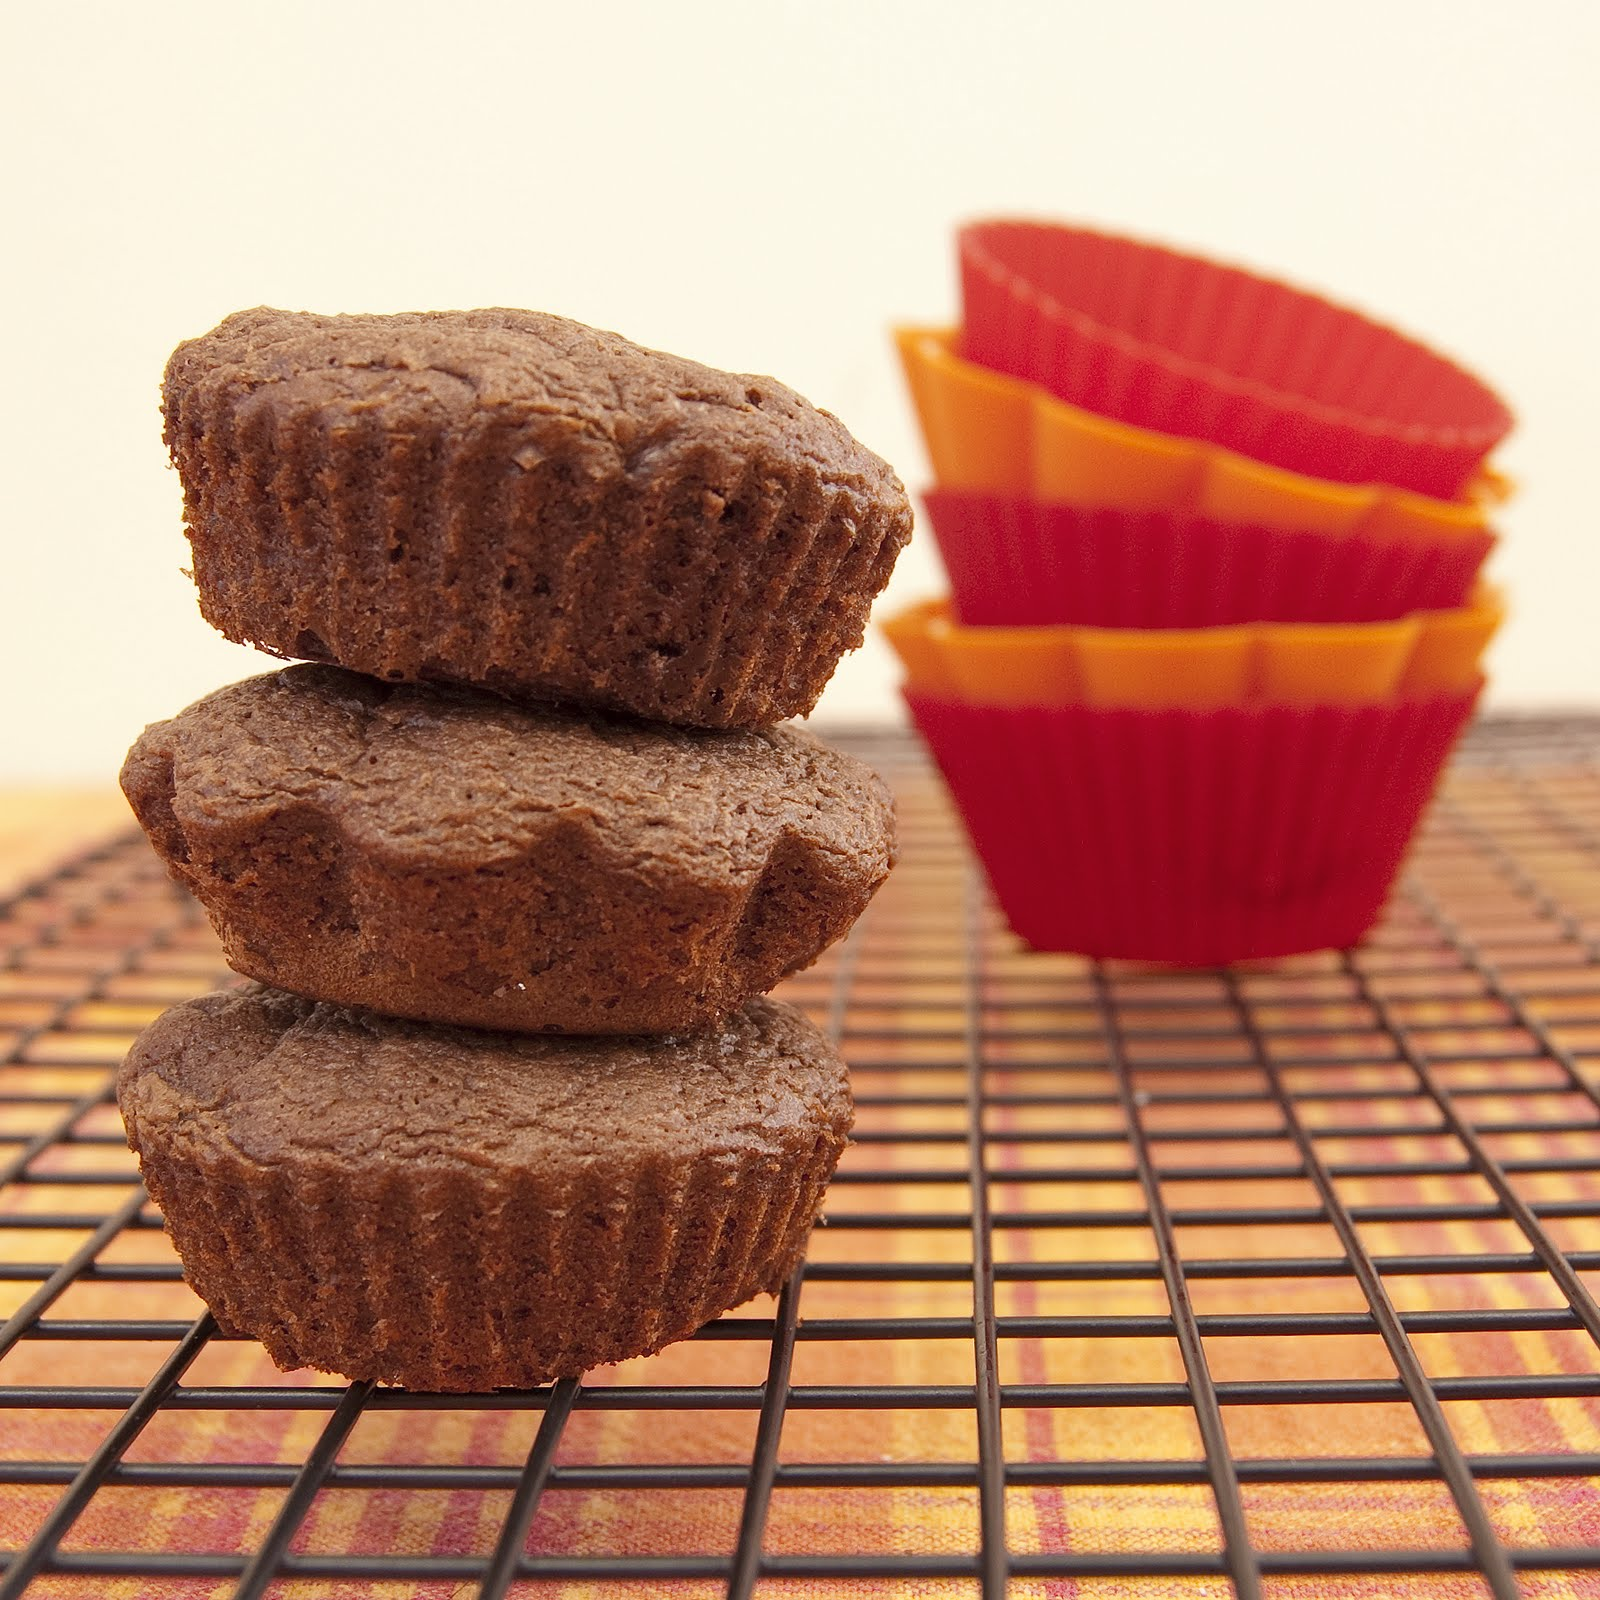 CaffeIna: Baking with Carla: Nutella Fudge Brownies